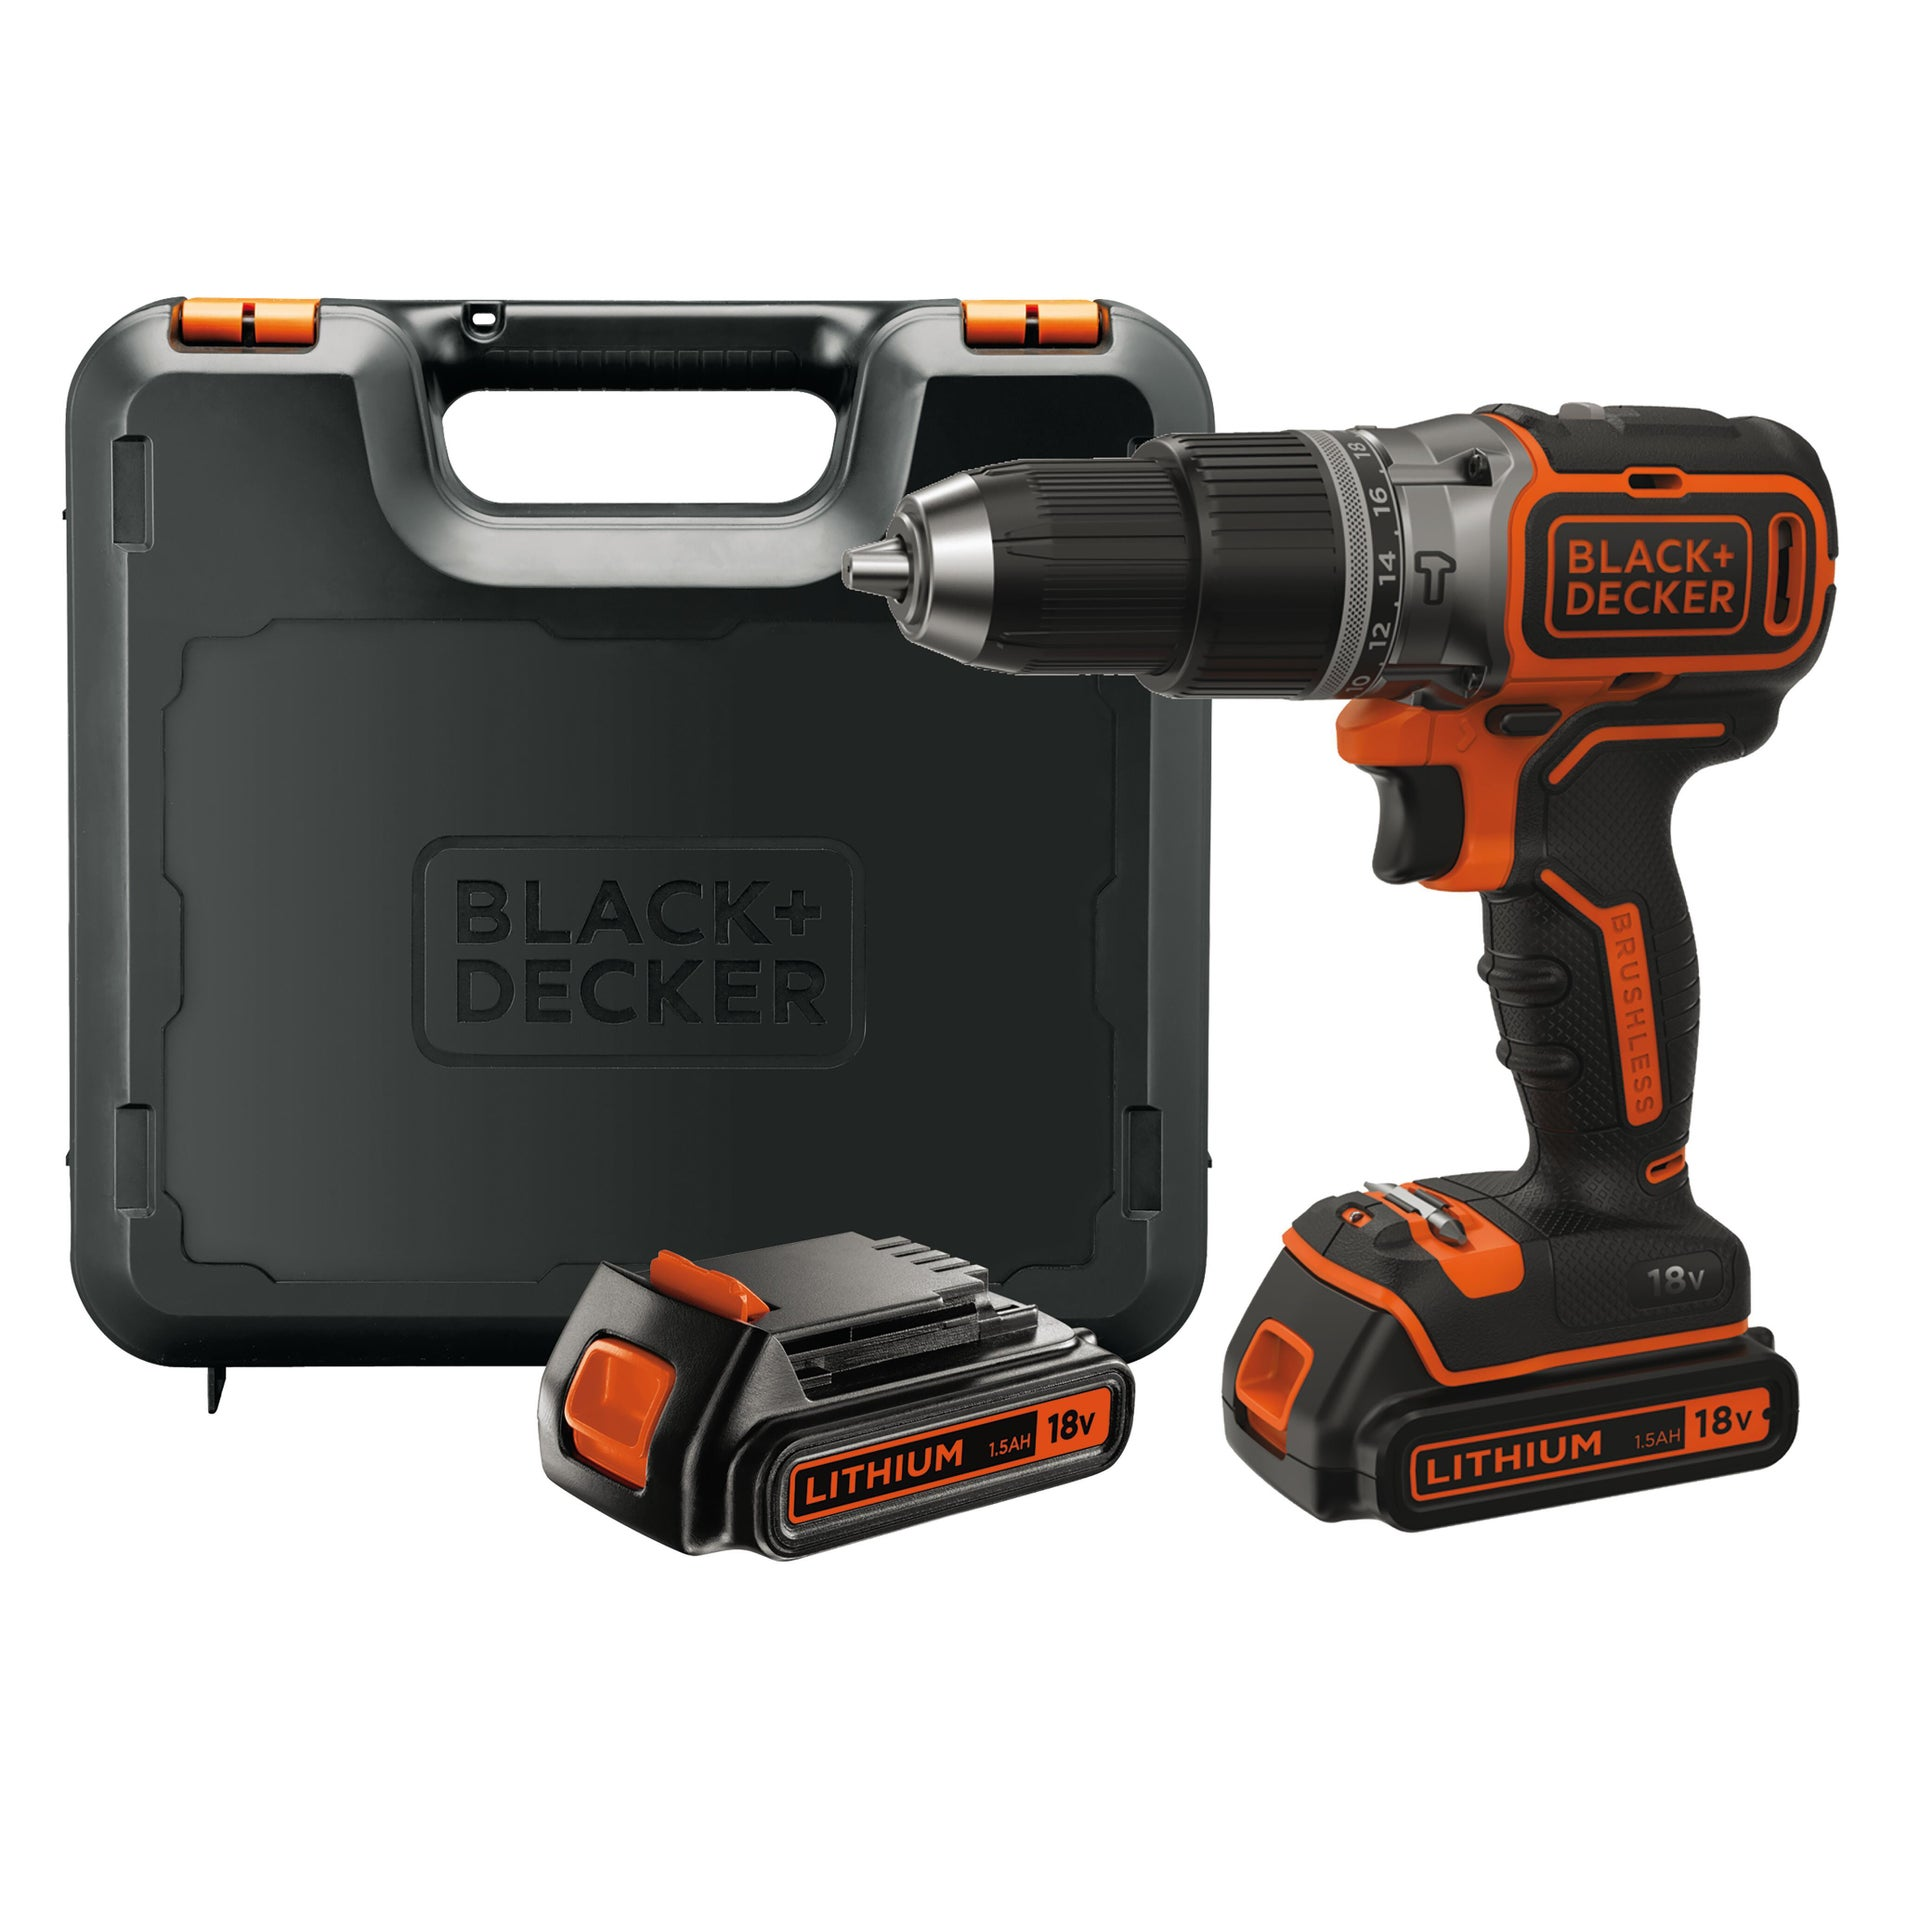 Trapano avvitatore a batteria BLACK + DECKER BL188KB-QW 18 V, 1.5 Ah, 2 batterie - 9